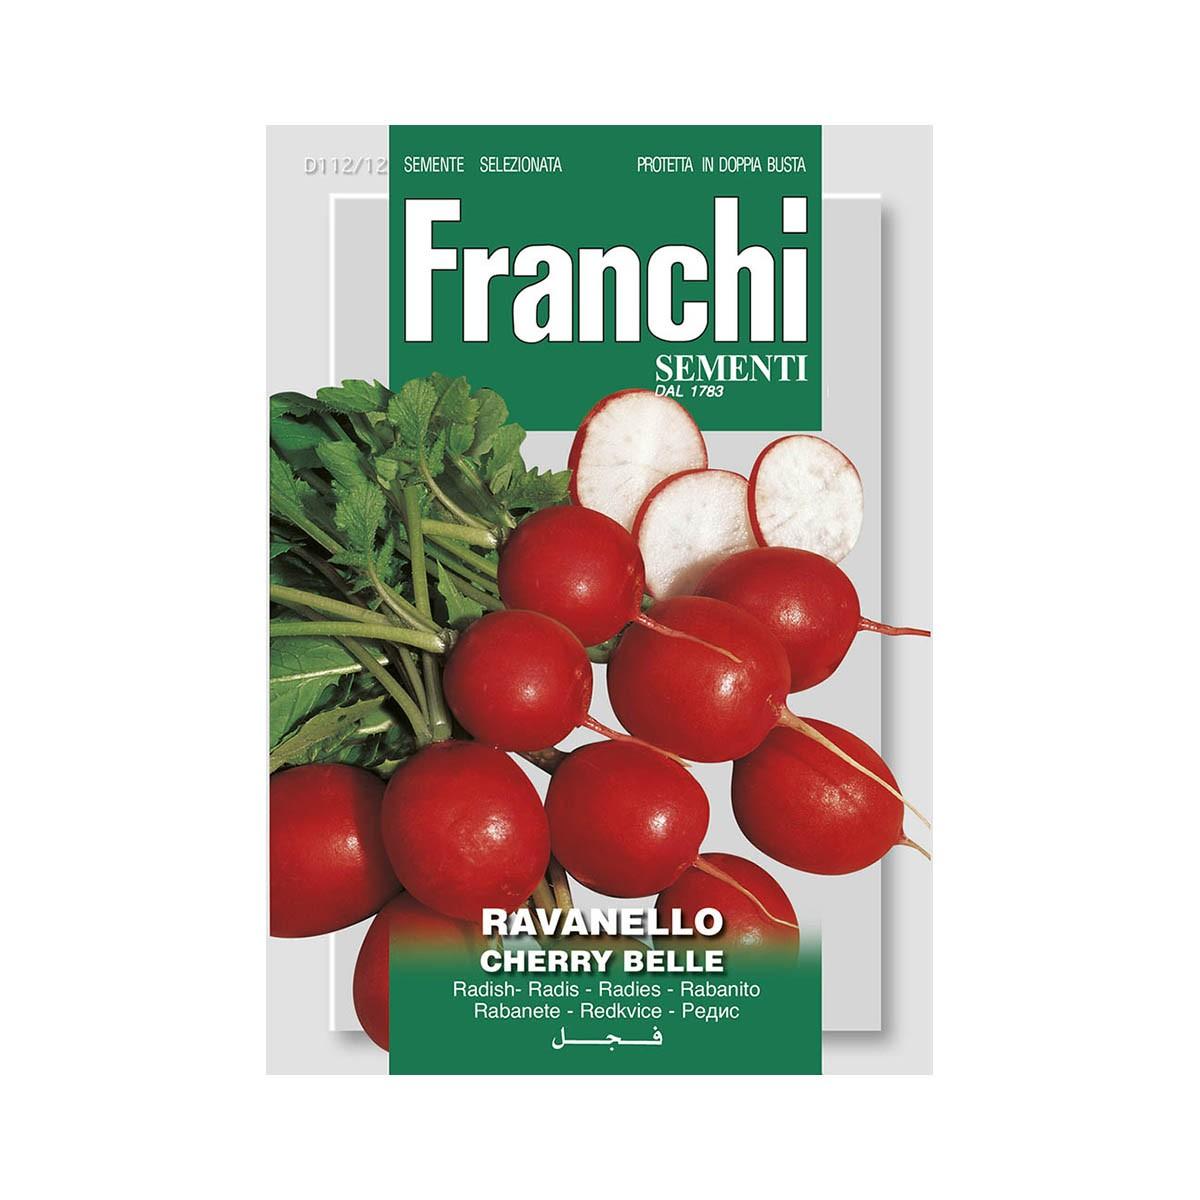 Semi Ravanello Cherry Belle